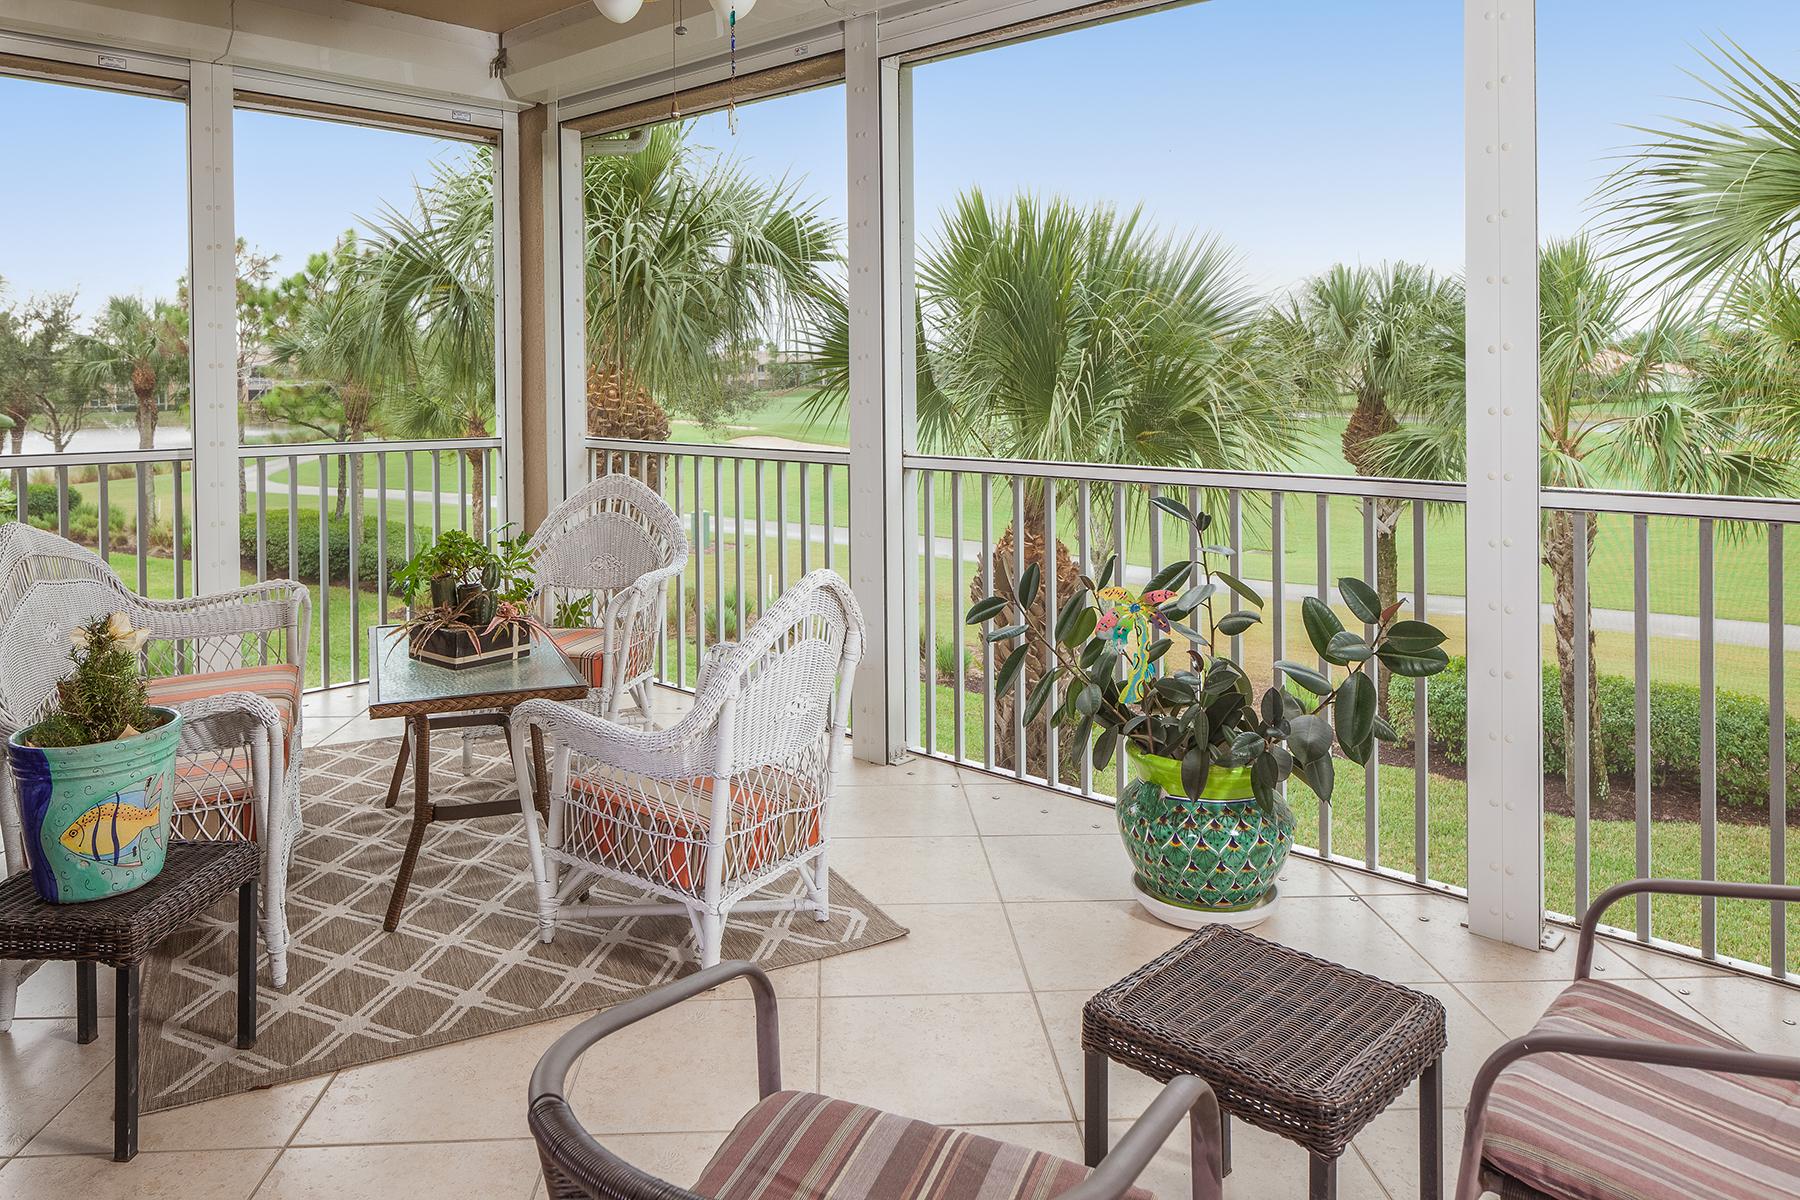 Nhà chung cư vì Bán tại SHADOW WOOD AT THE BROOKS - OAK HAMMOCK 11 10442 Autumn Breeze Dr 201 Estero, Florida, 34135 Hoa Kỳ